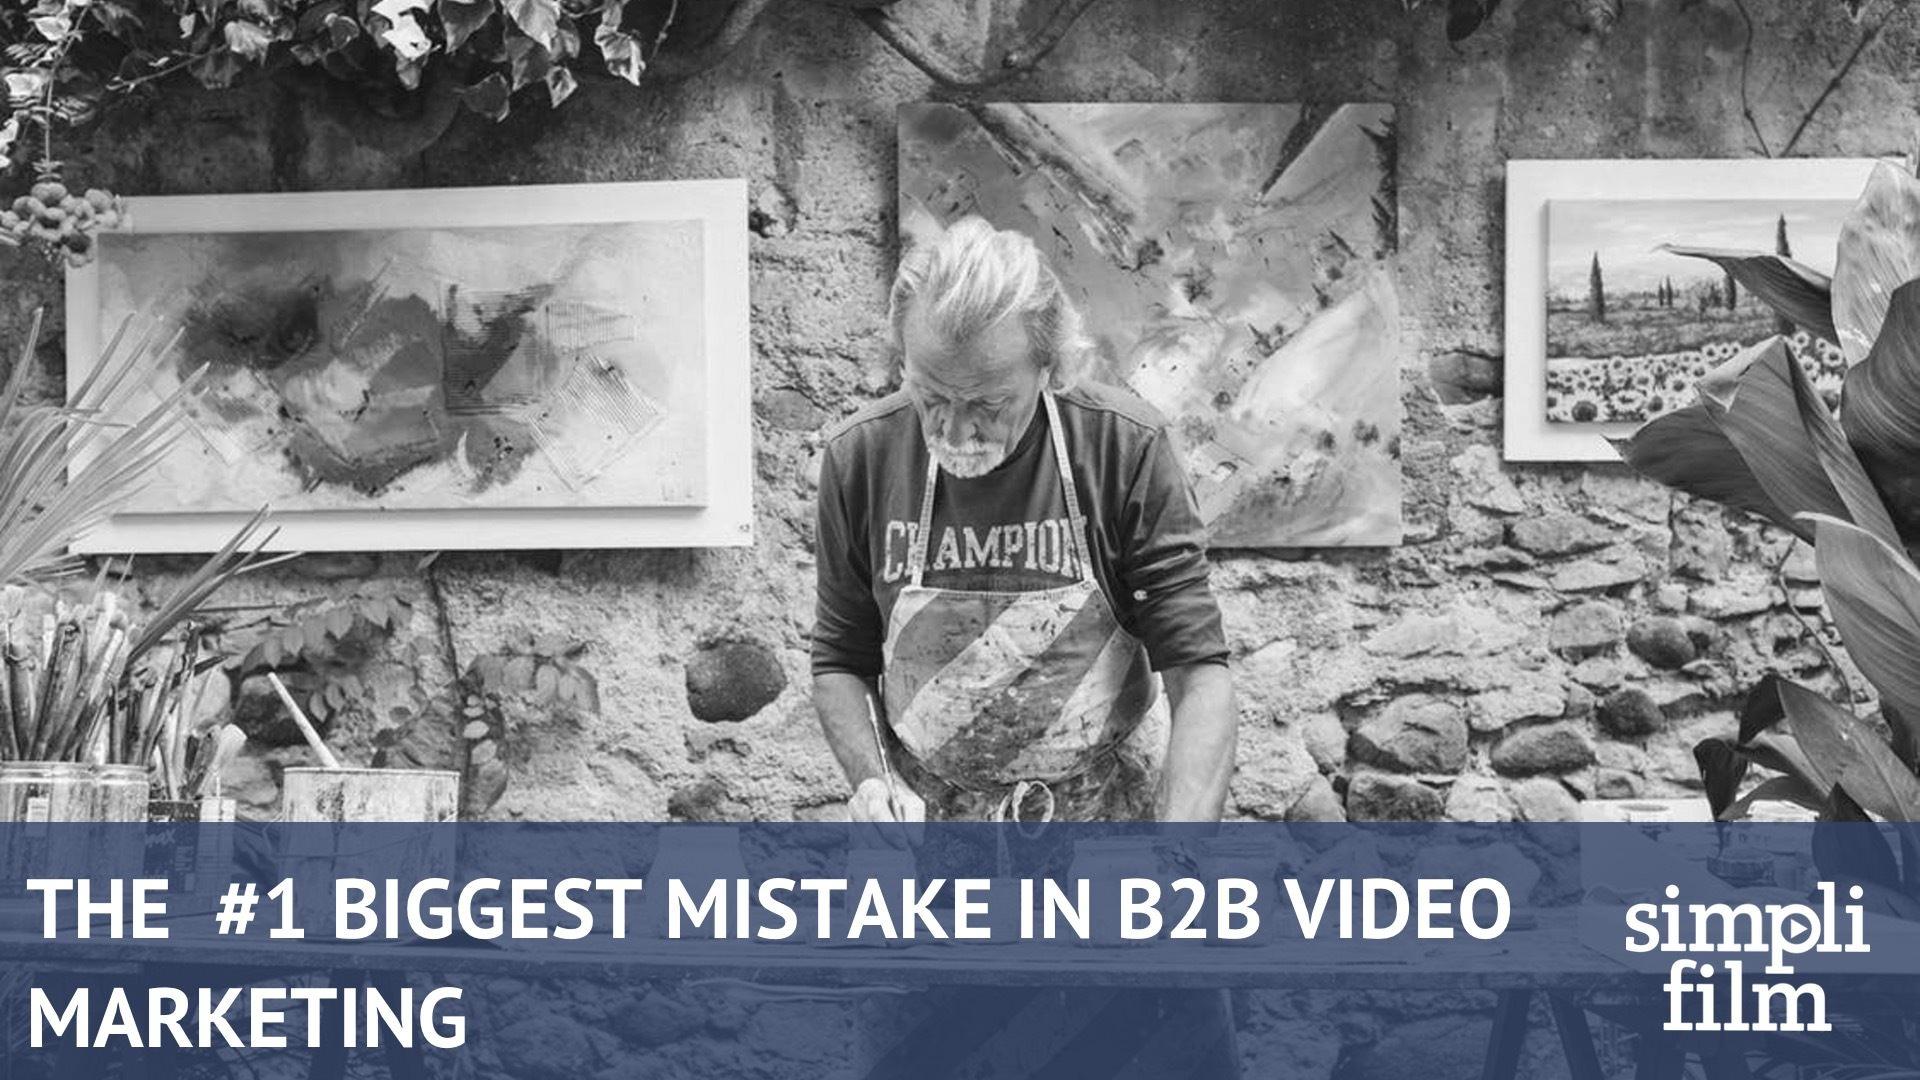 B2B Video Mistakes